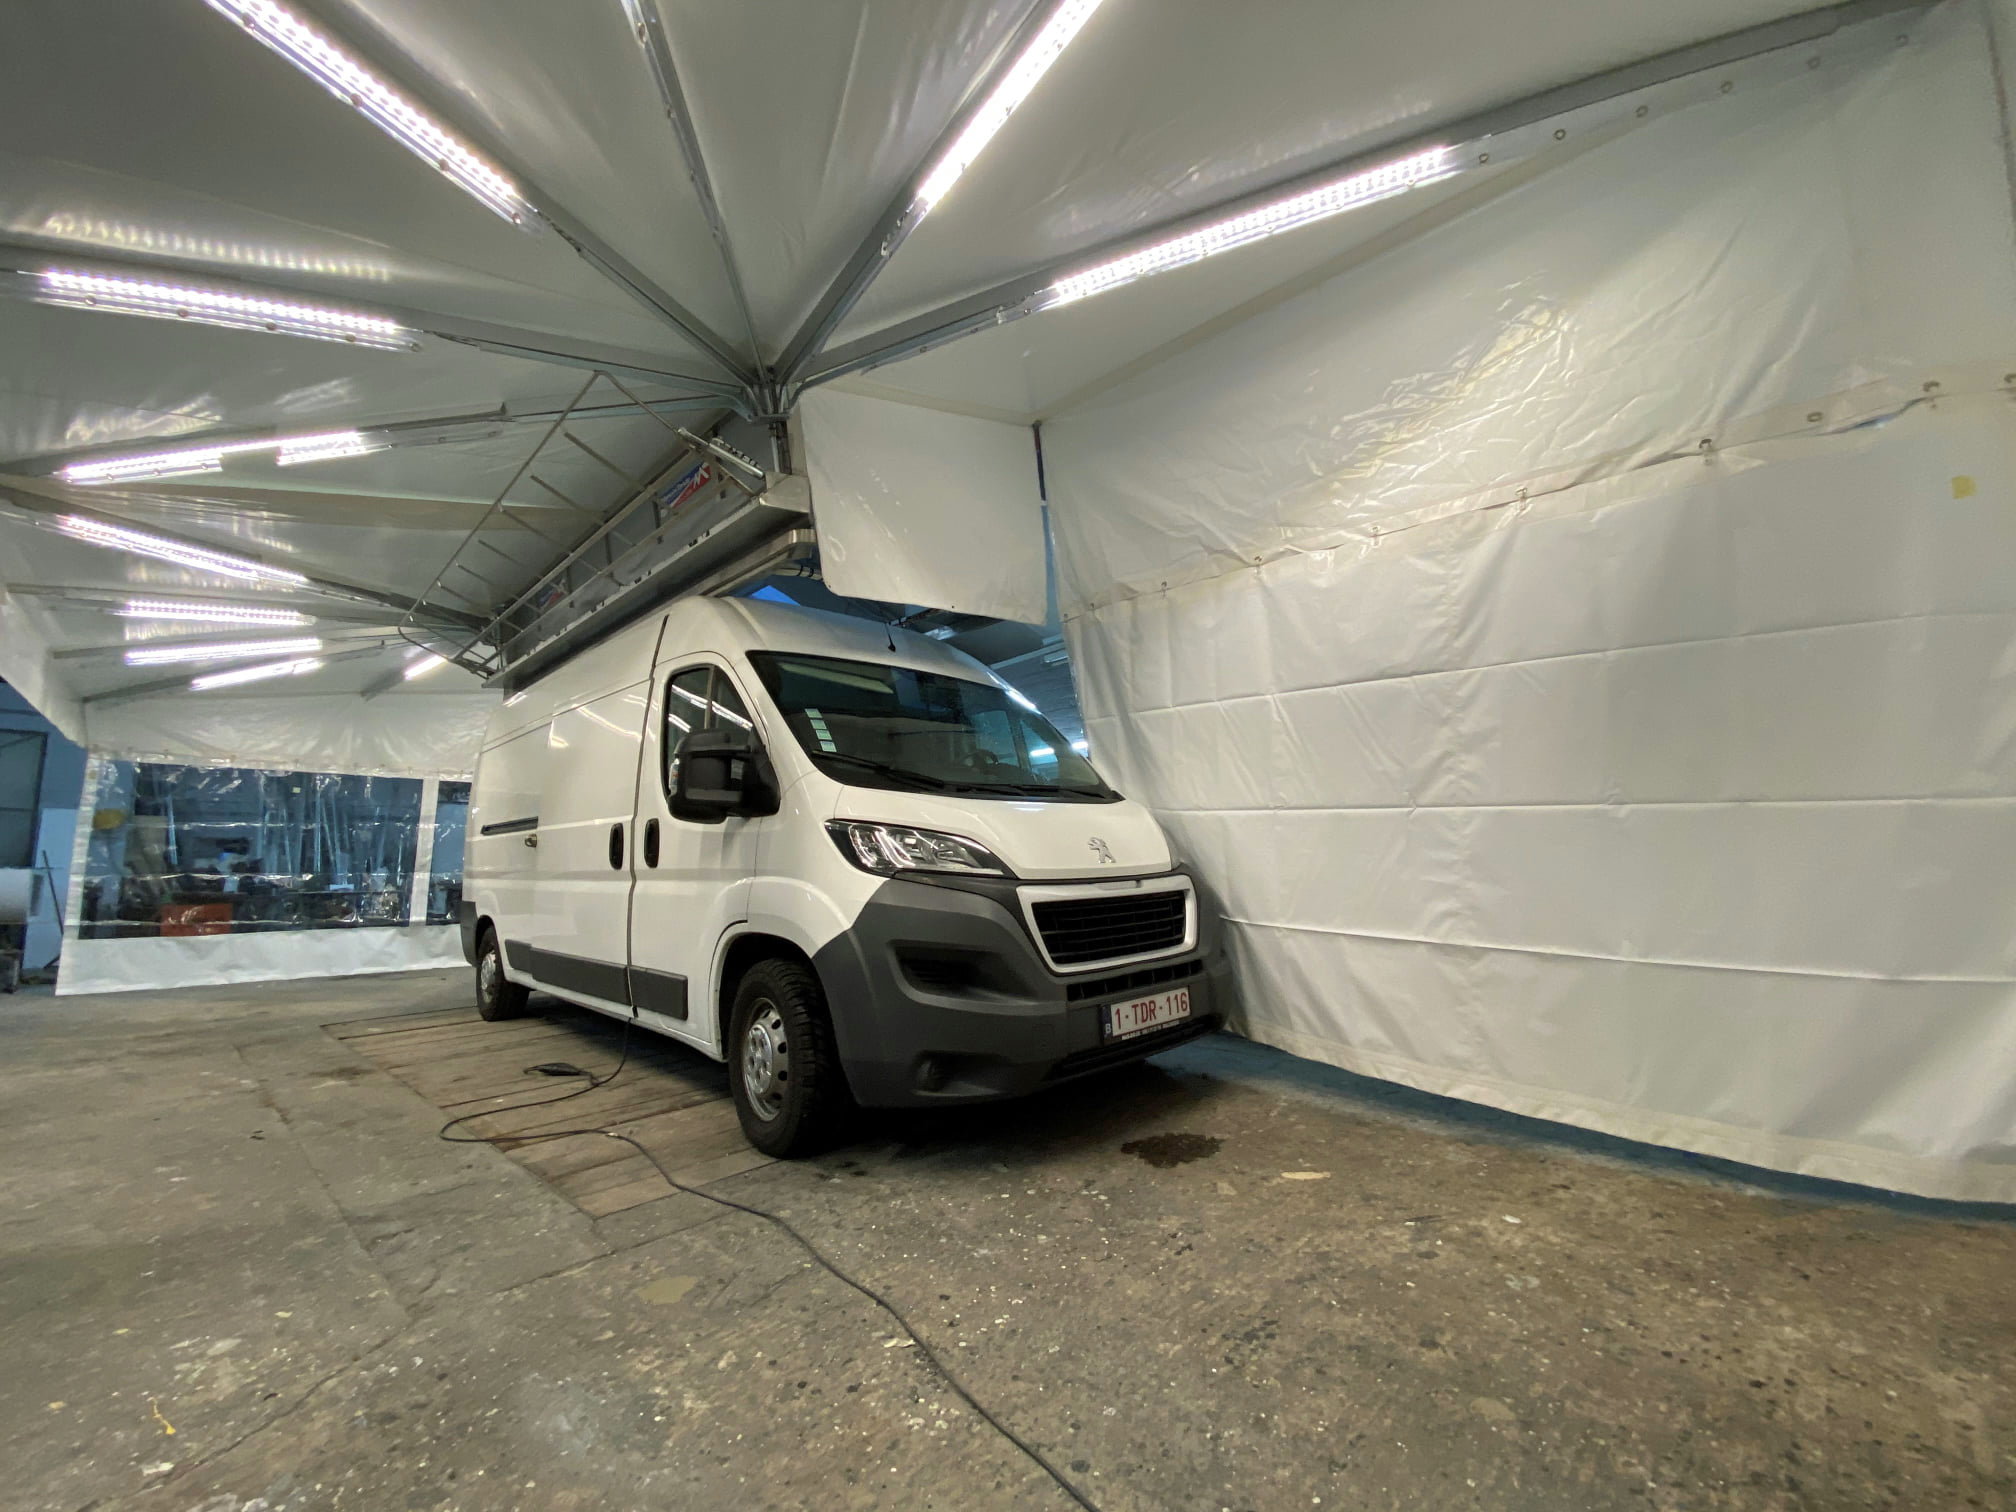 Peugeot-met-tentsysteem-lan-g-12-mtr-breed-4-30--(1)